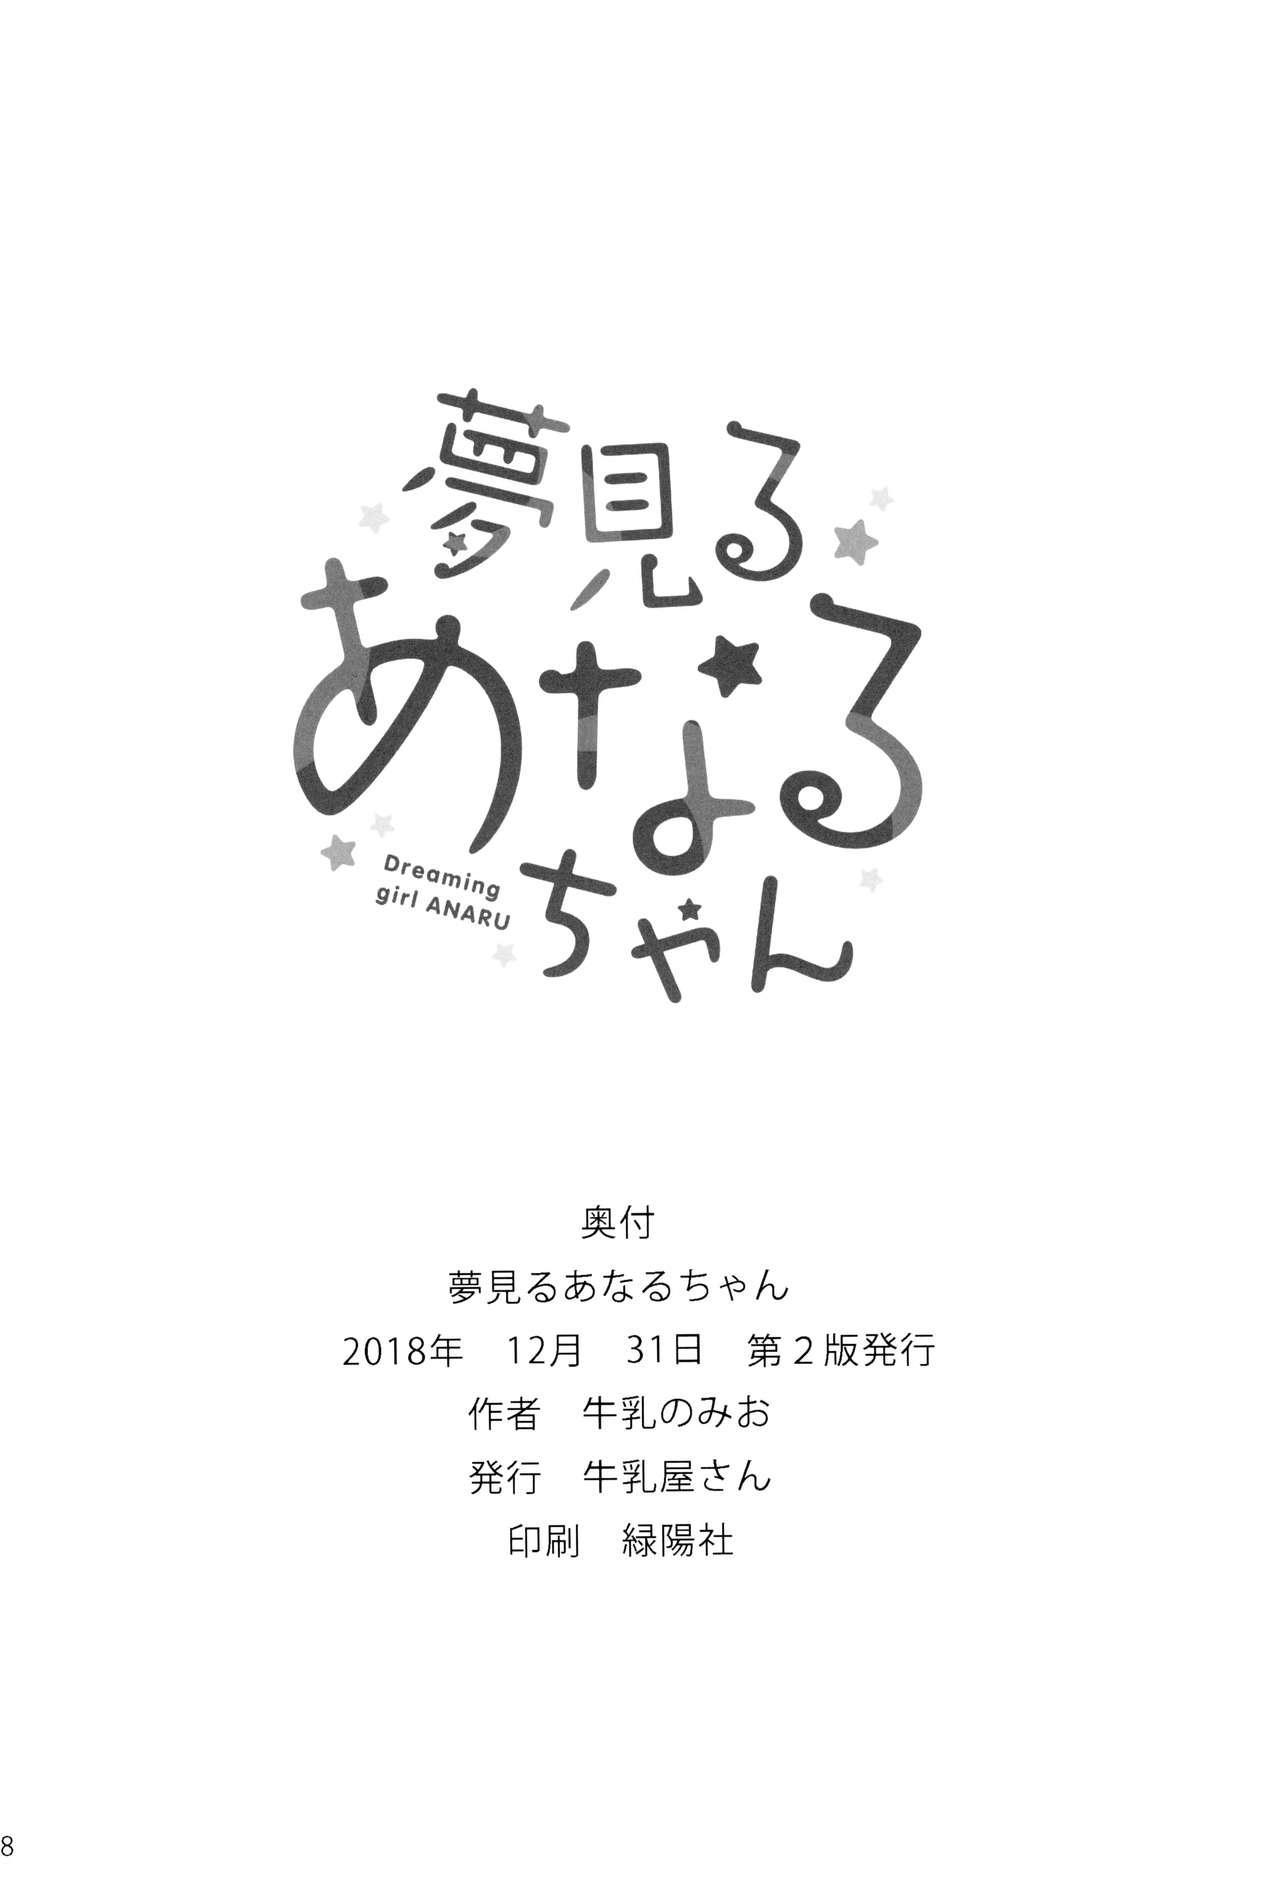 (C95) [Gyuunyuuya-san (Gyuunyuu Nomio)] Yumemiru Anaru-chan - Dreaming Girl ANARU [Chinese] [绅士仓库汉化] 18